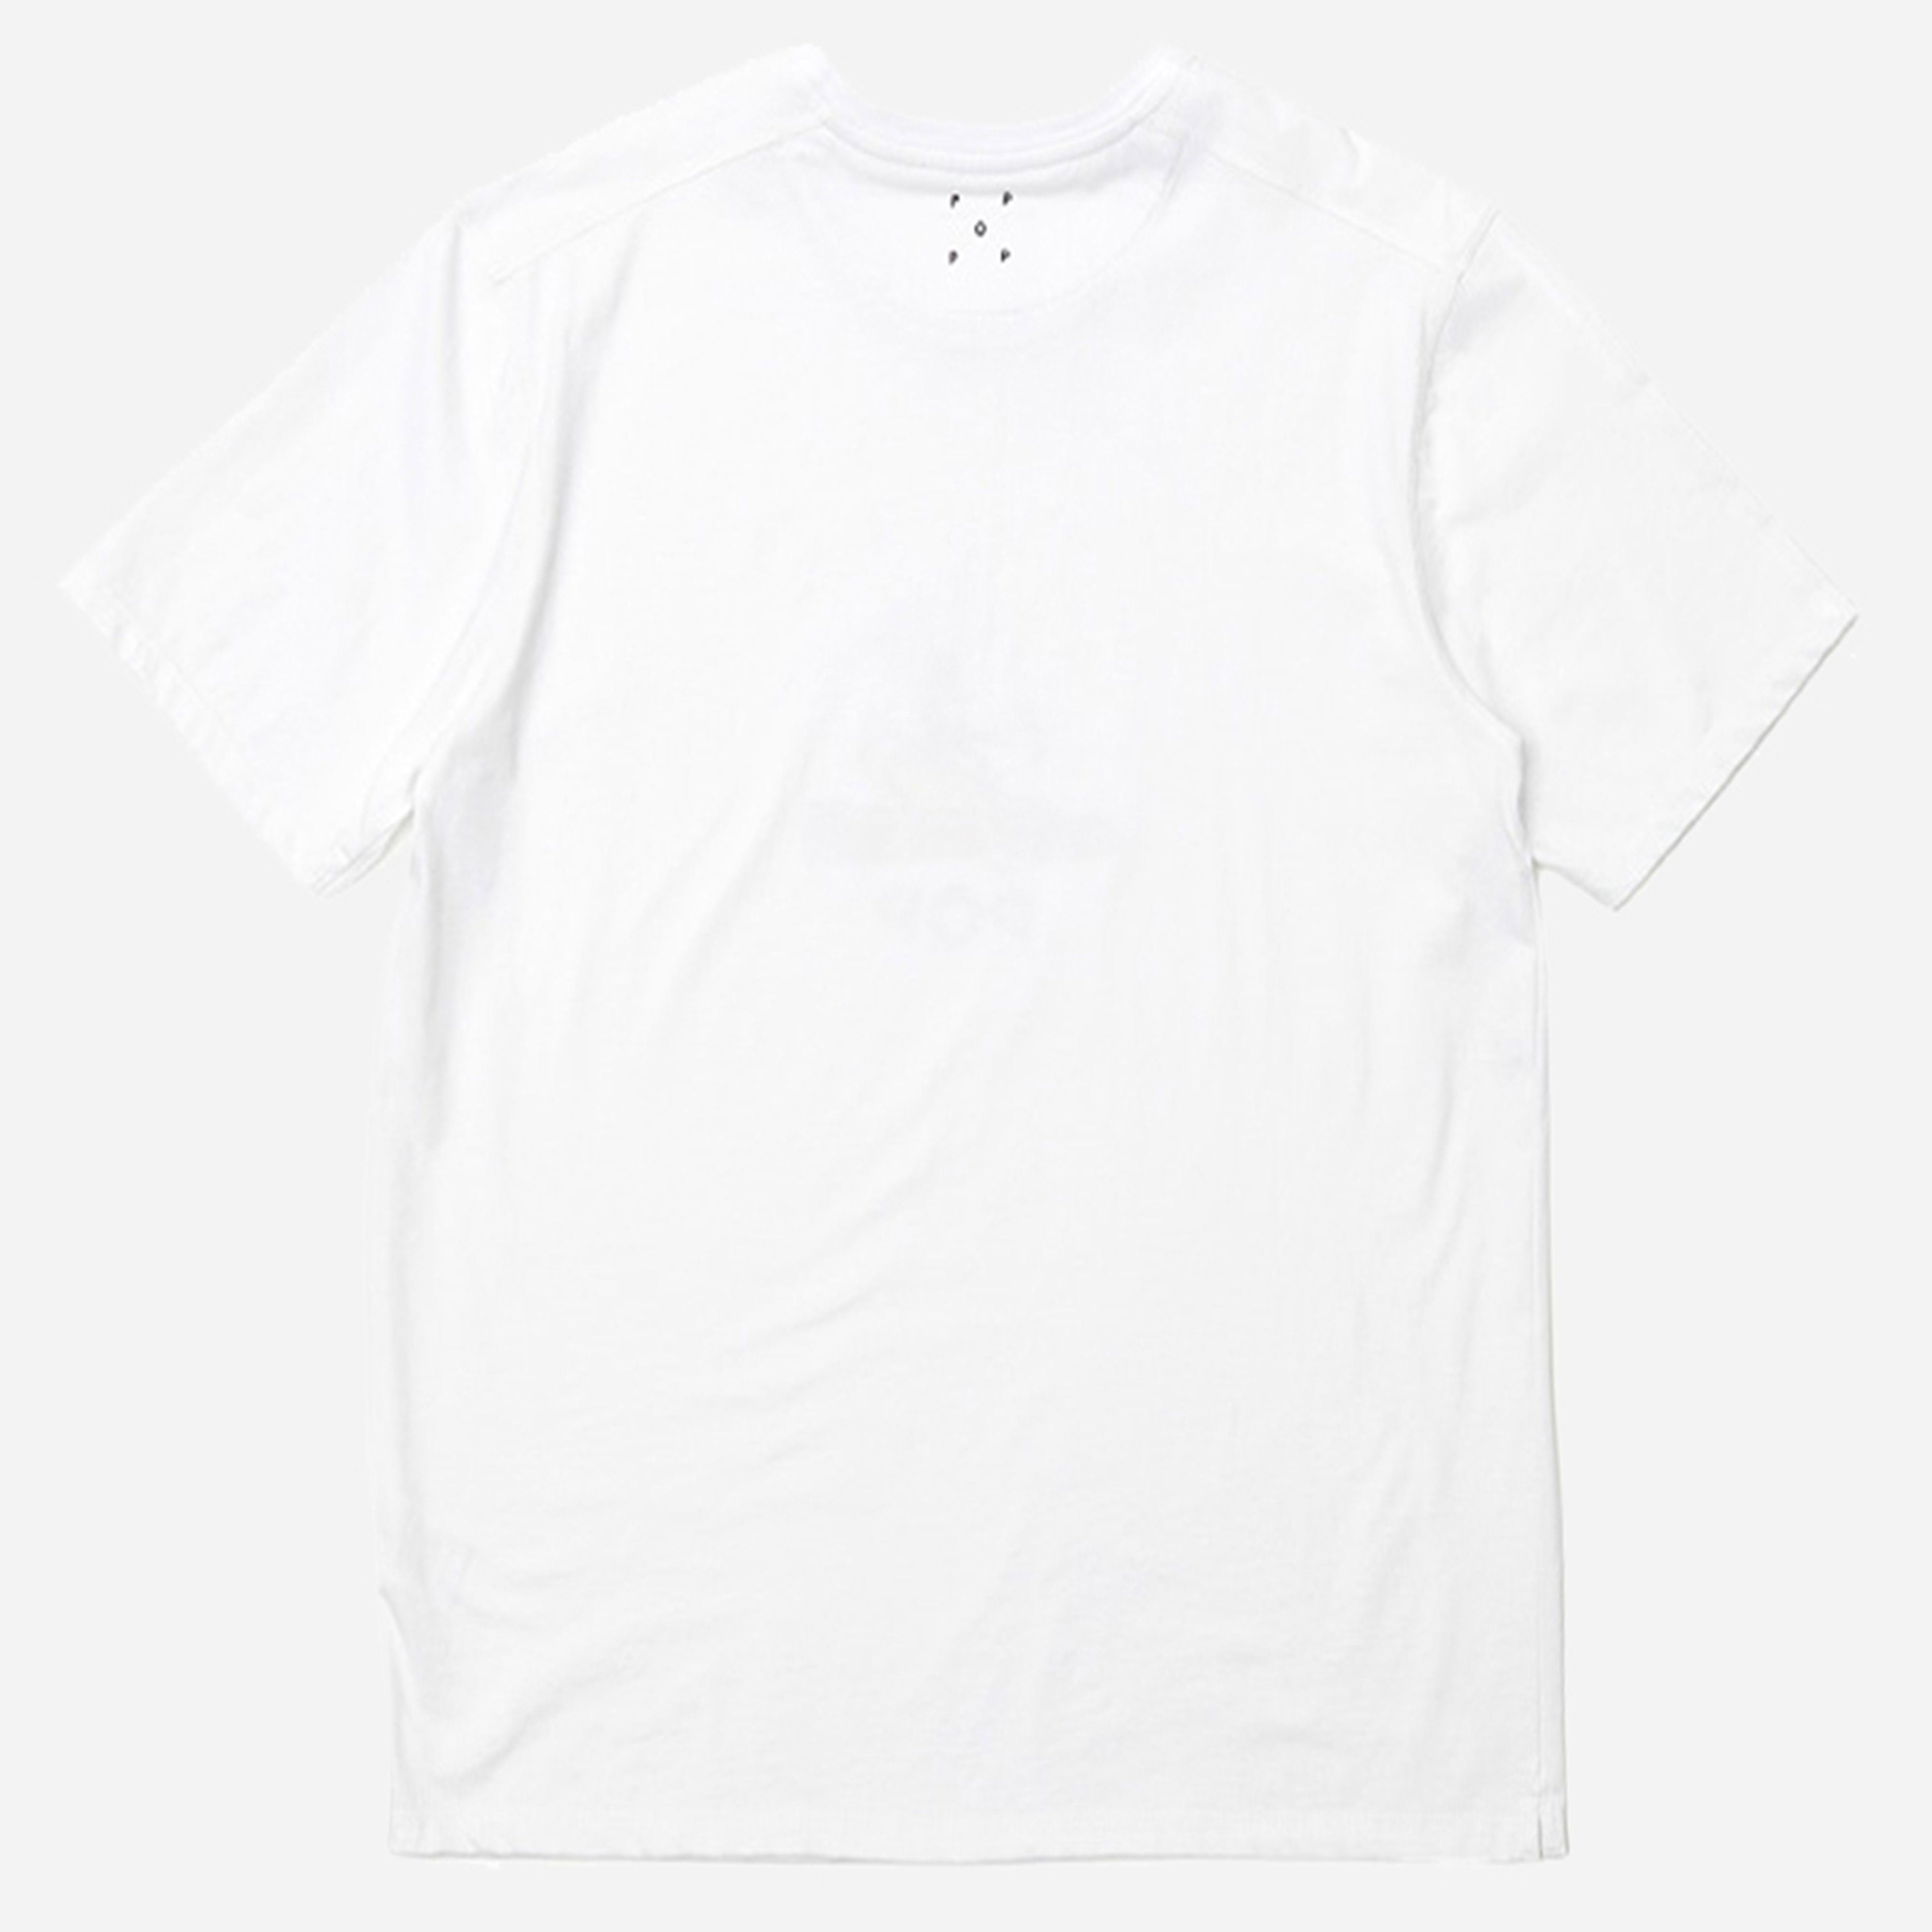 Pop Trading Company Tokyo T-Shirt